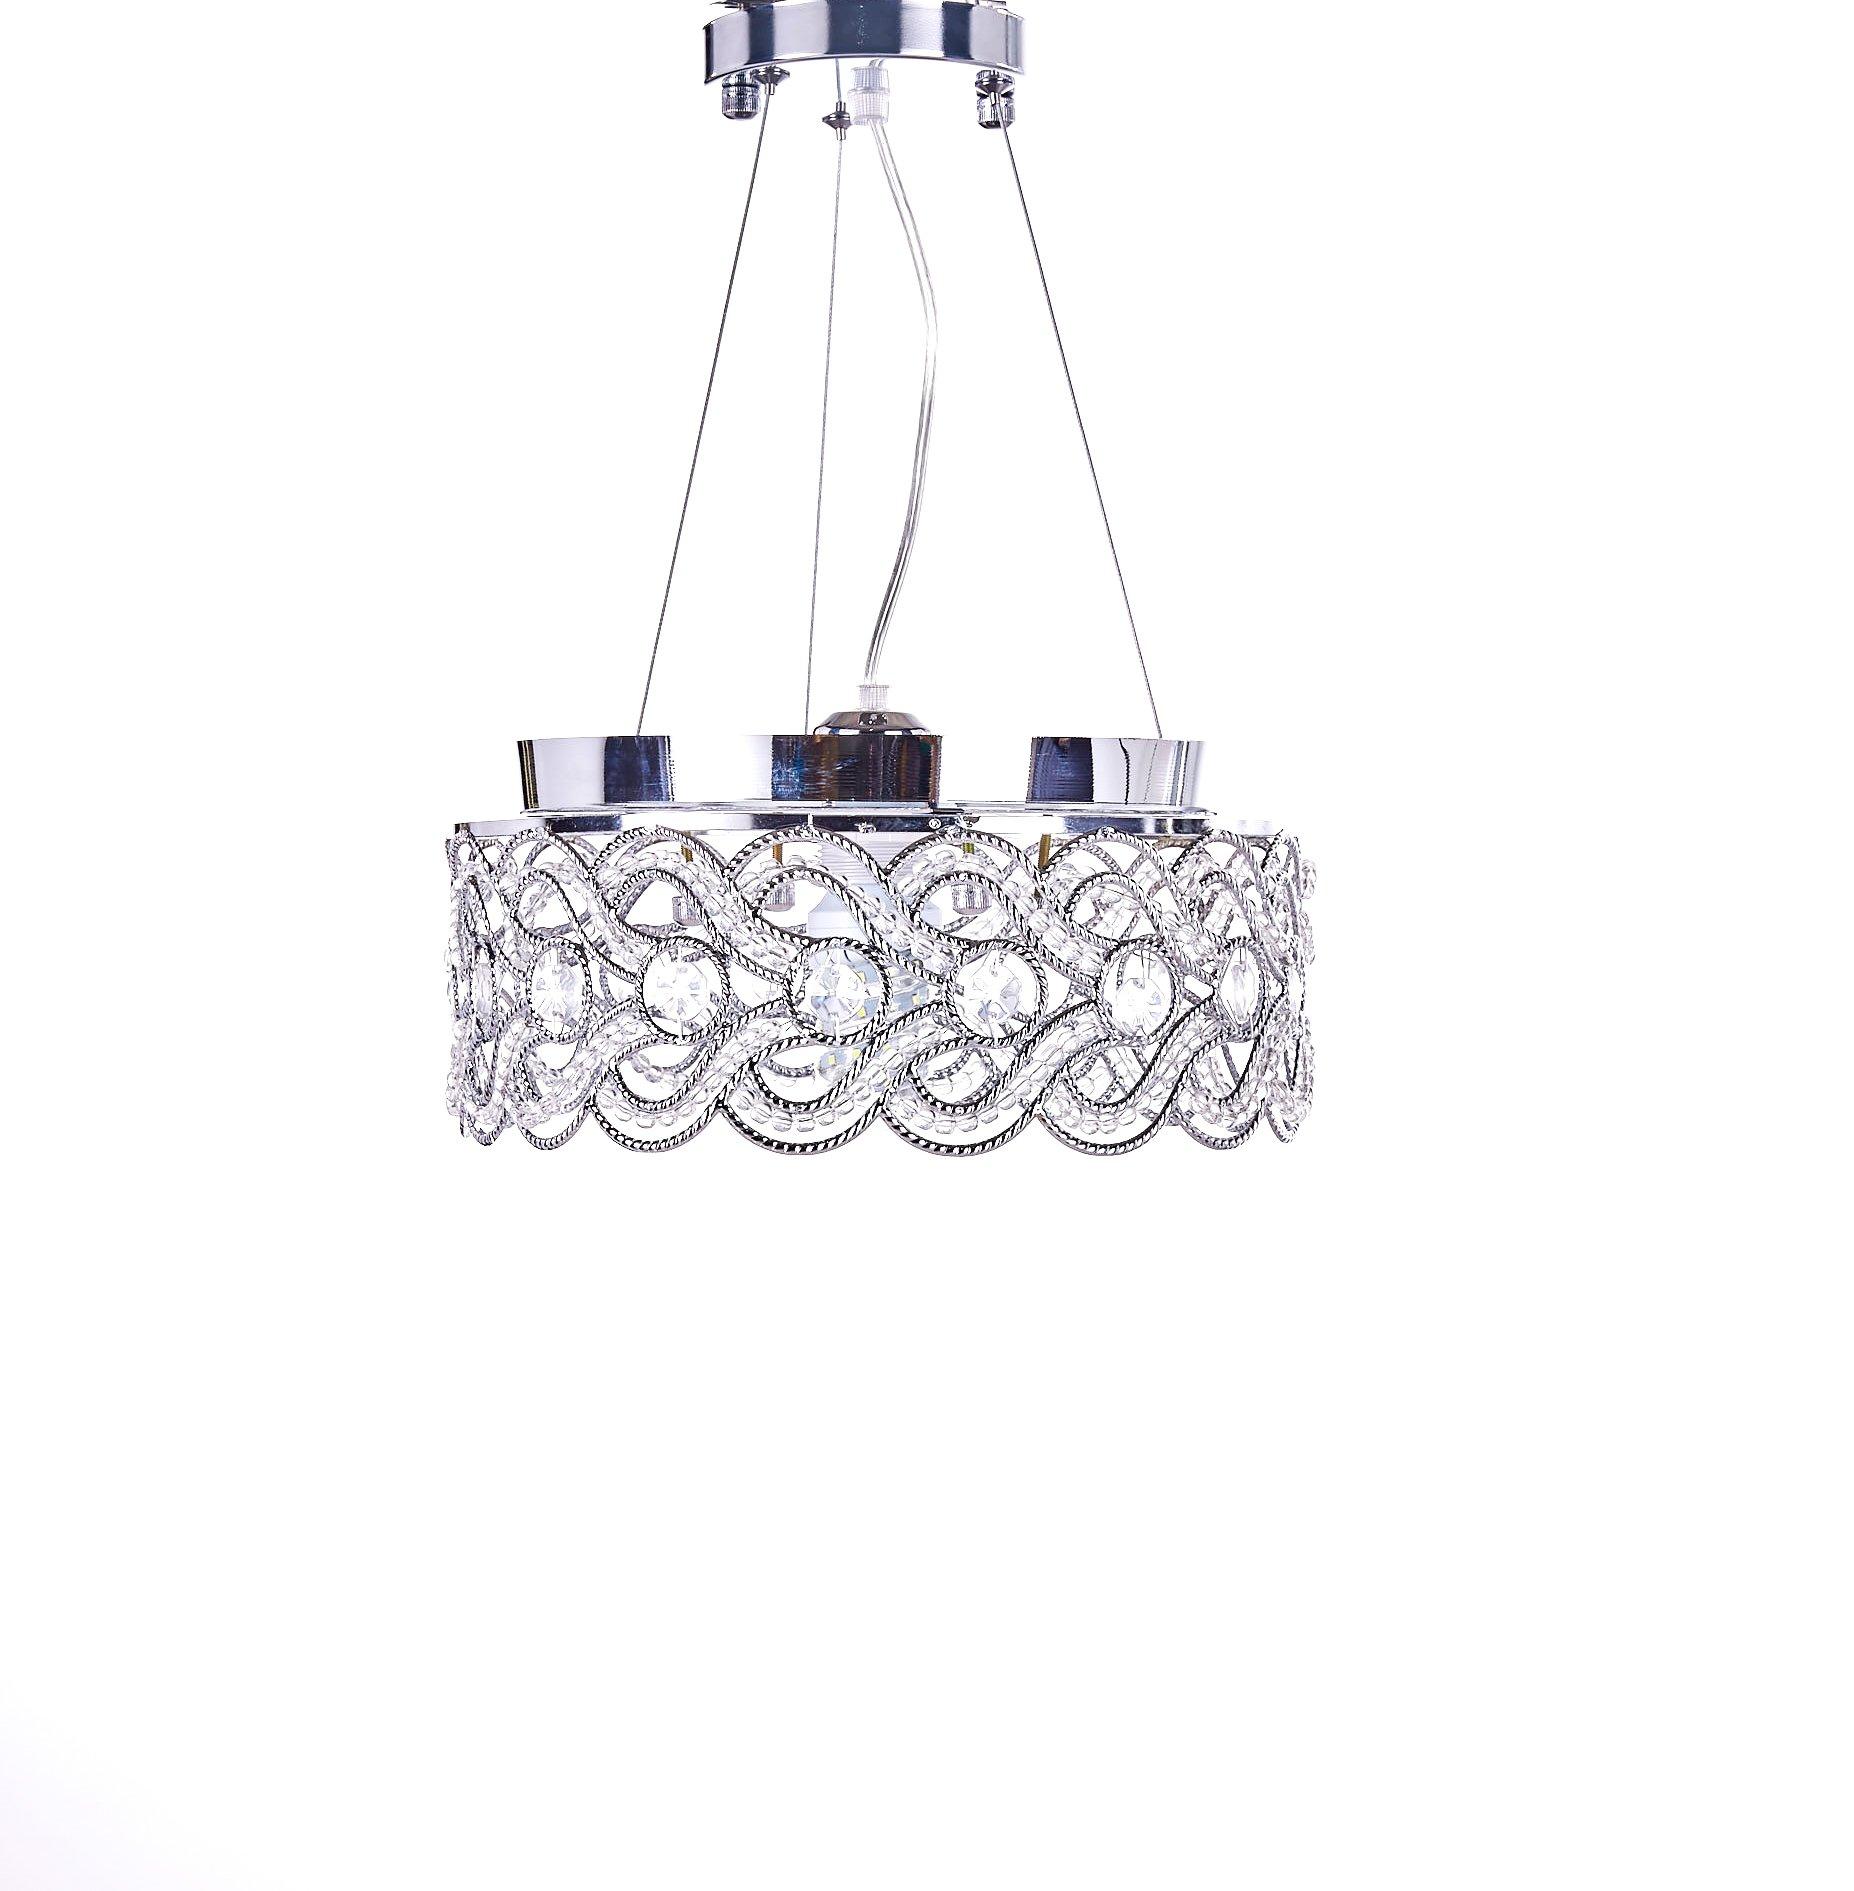 SwanHouse Flush Mount Pendant Ceiling Lighting Chandelier Silver Modern Lamp KPP W15 x H9 by SwanHouse (Image #1)